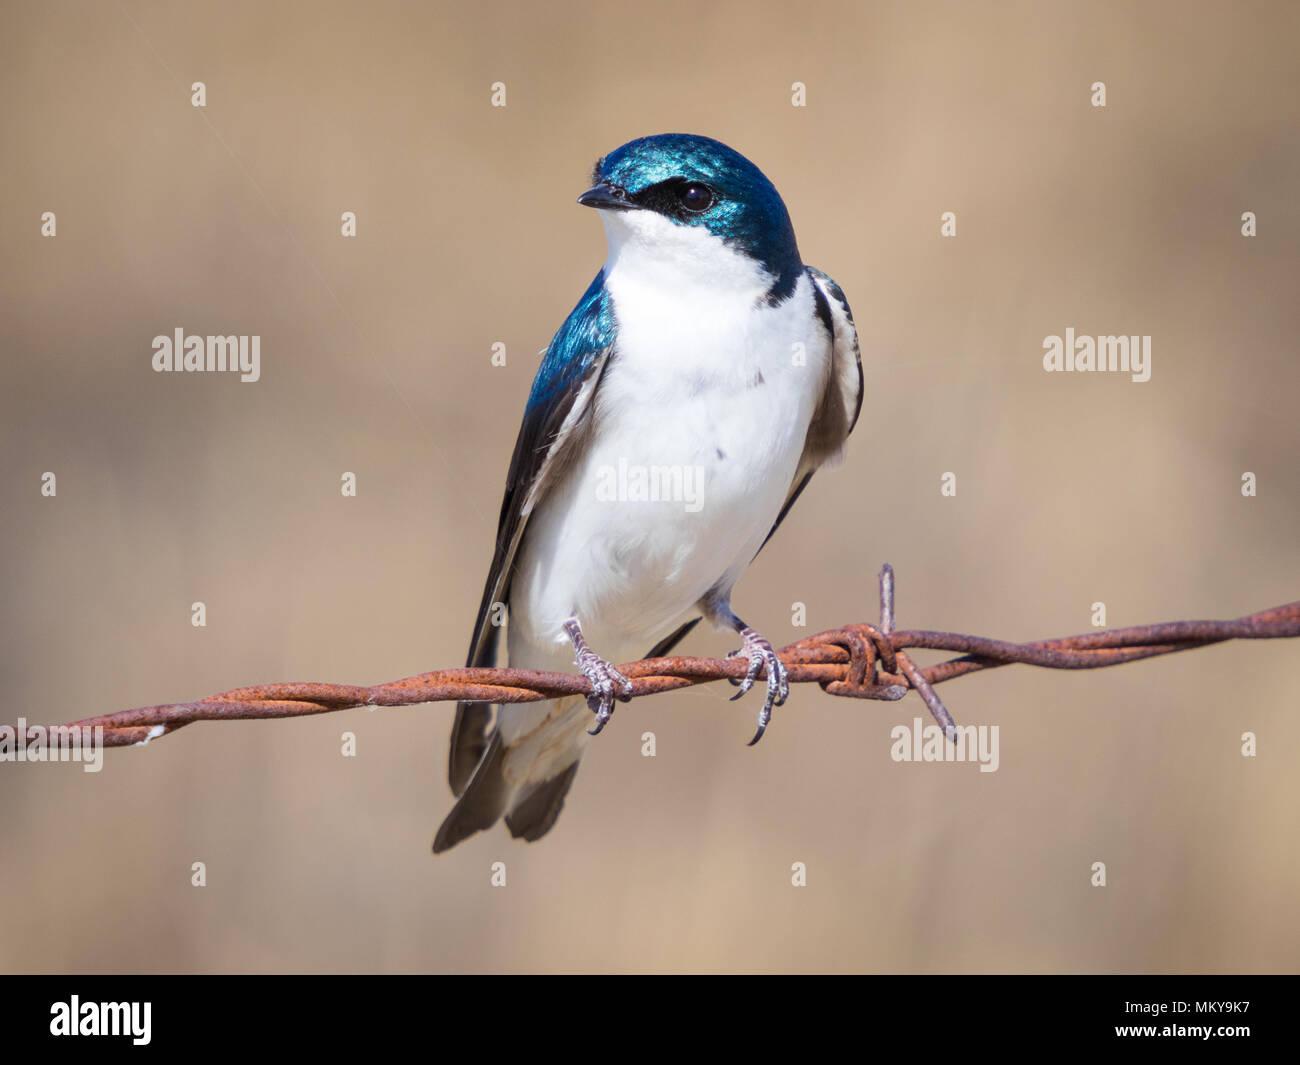 A tree swallow (Tachycineta bicolor) near Beaverhill Lake, Alberta, Canada. Stock Photo